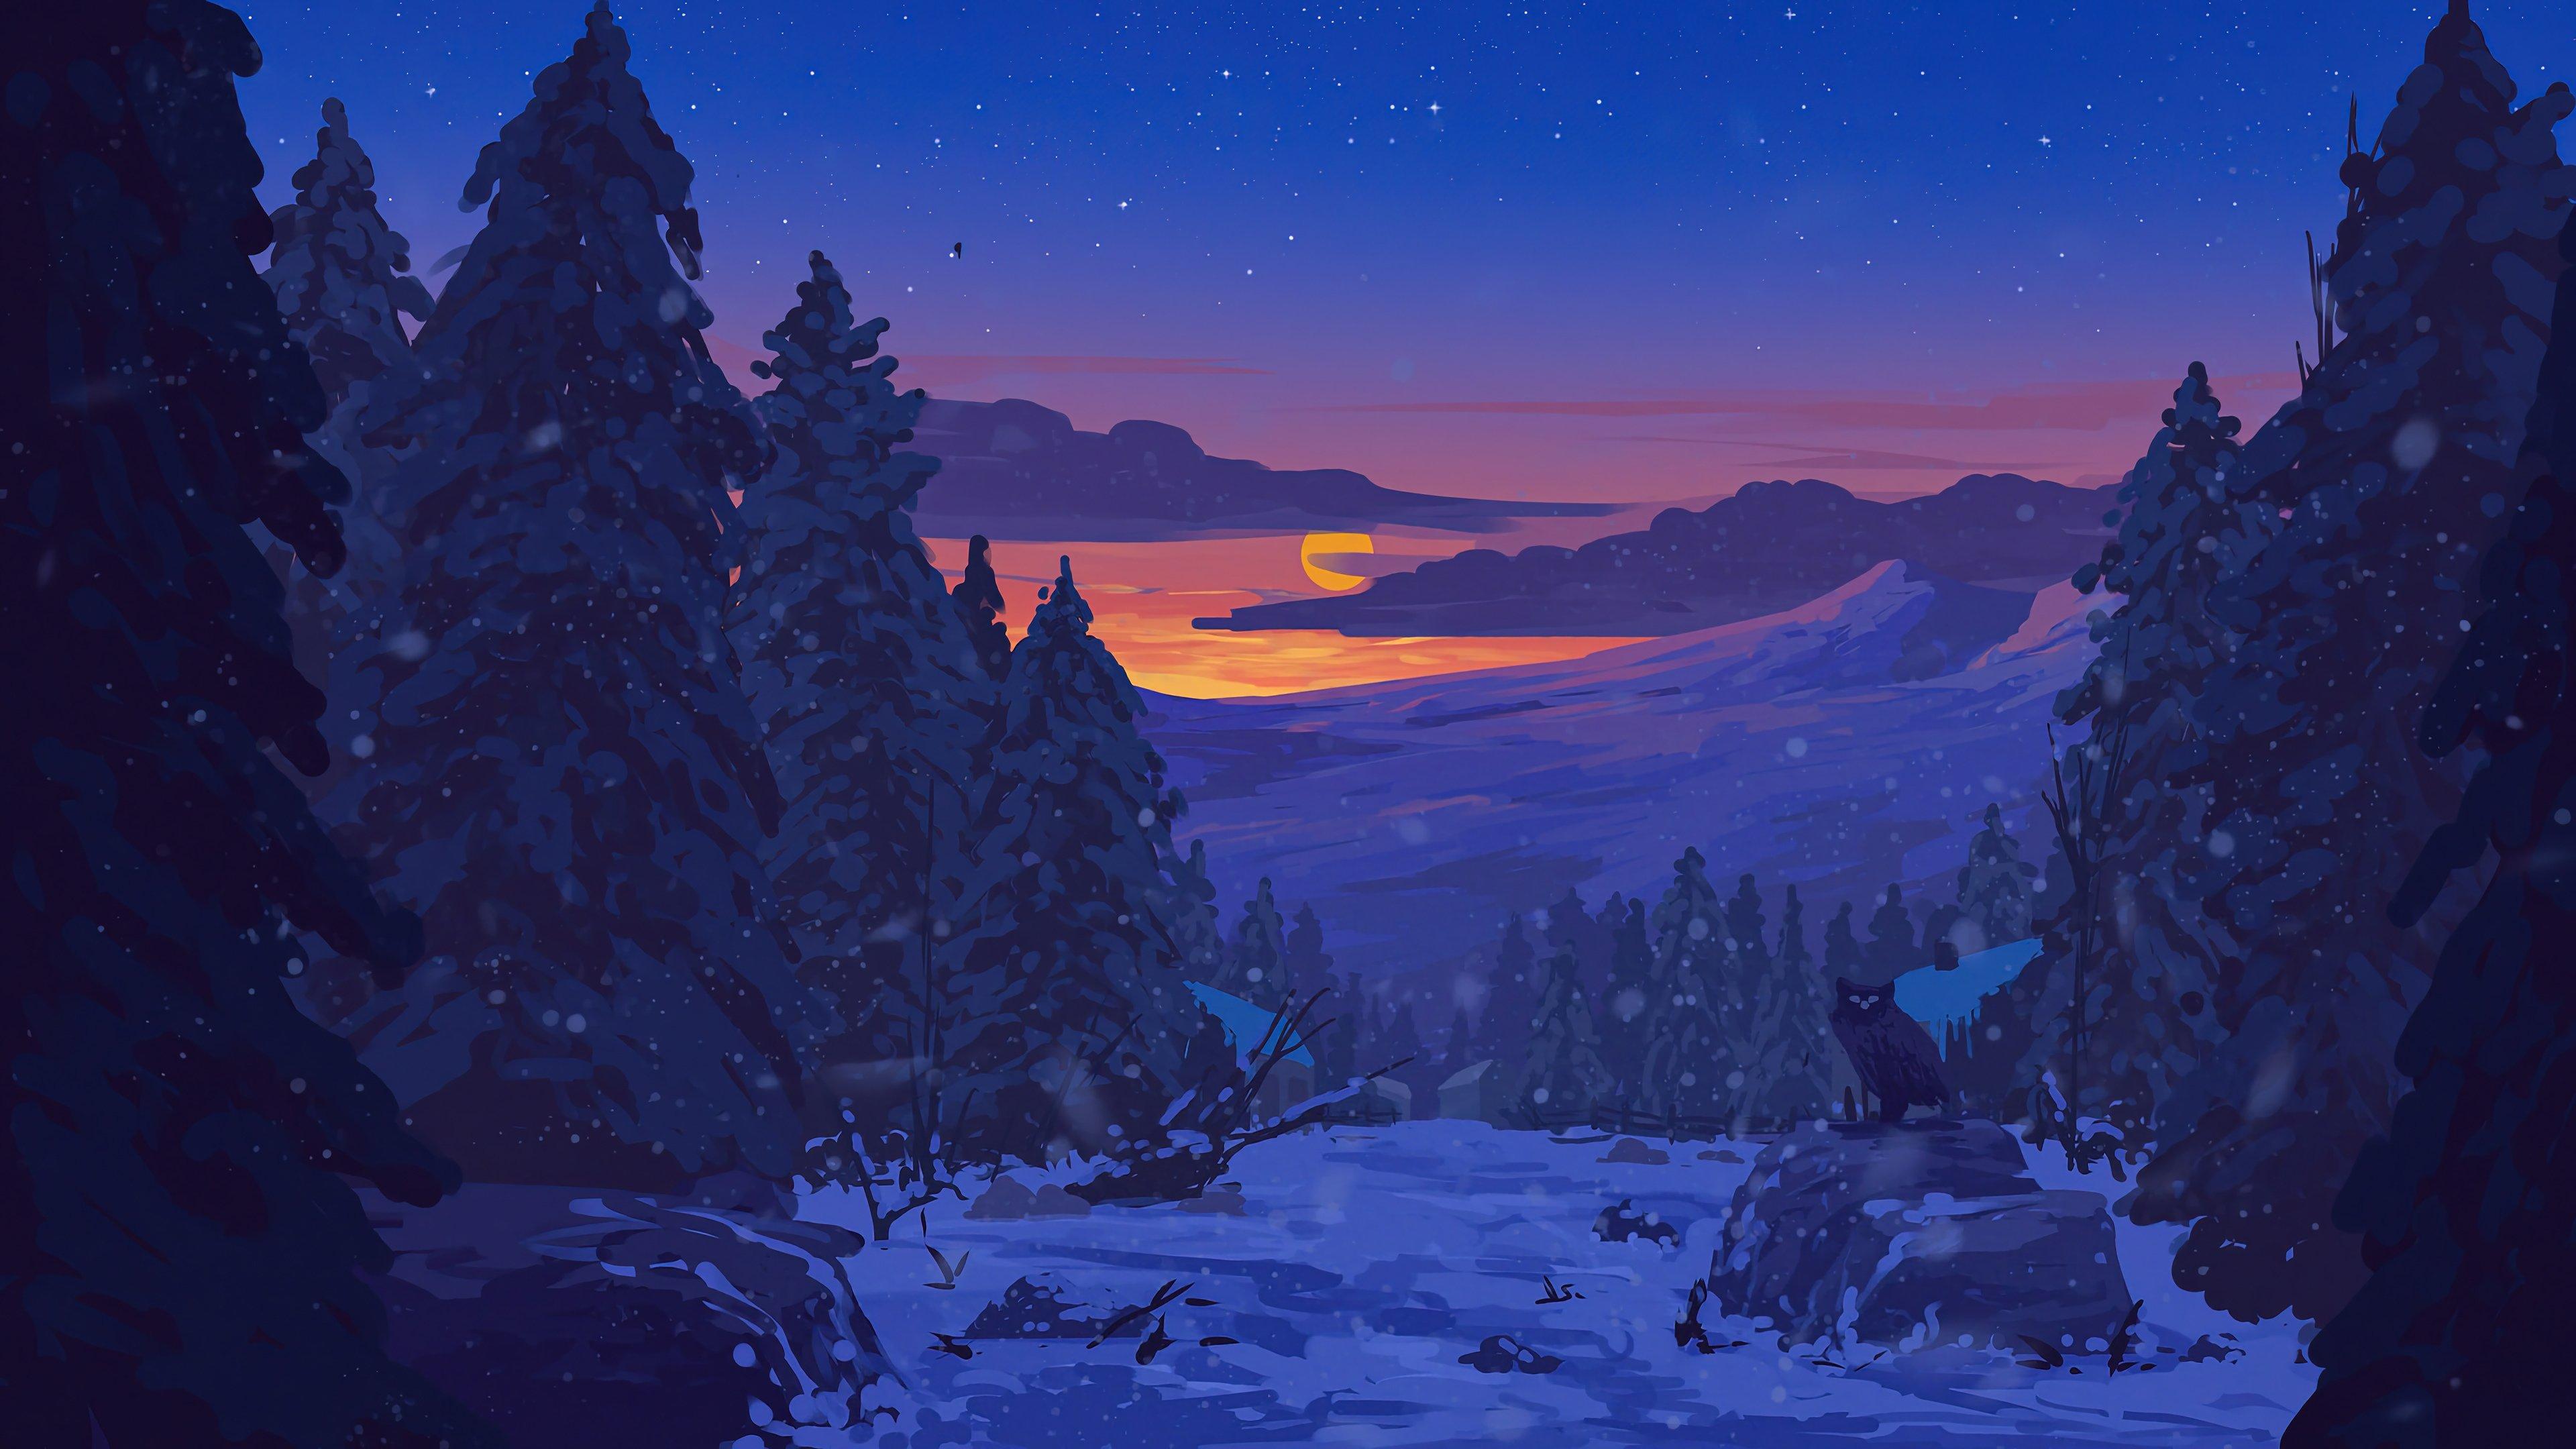 Fondos de pantalla Atardecer en paisaje nevado Arte Digital